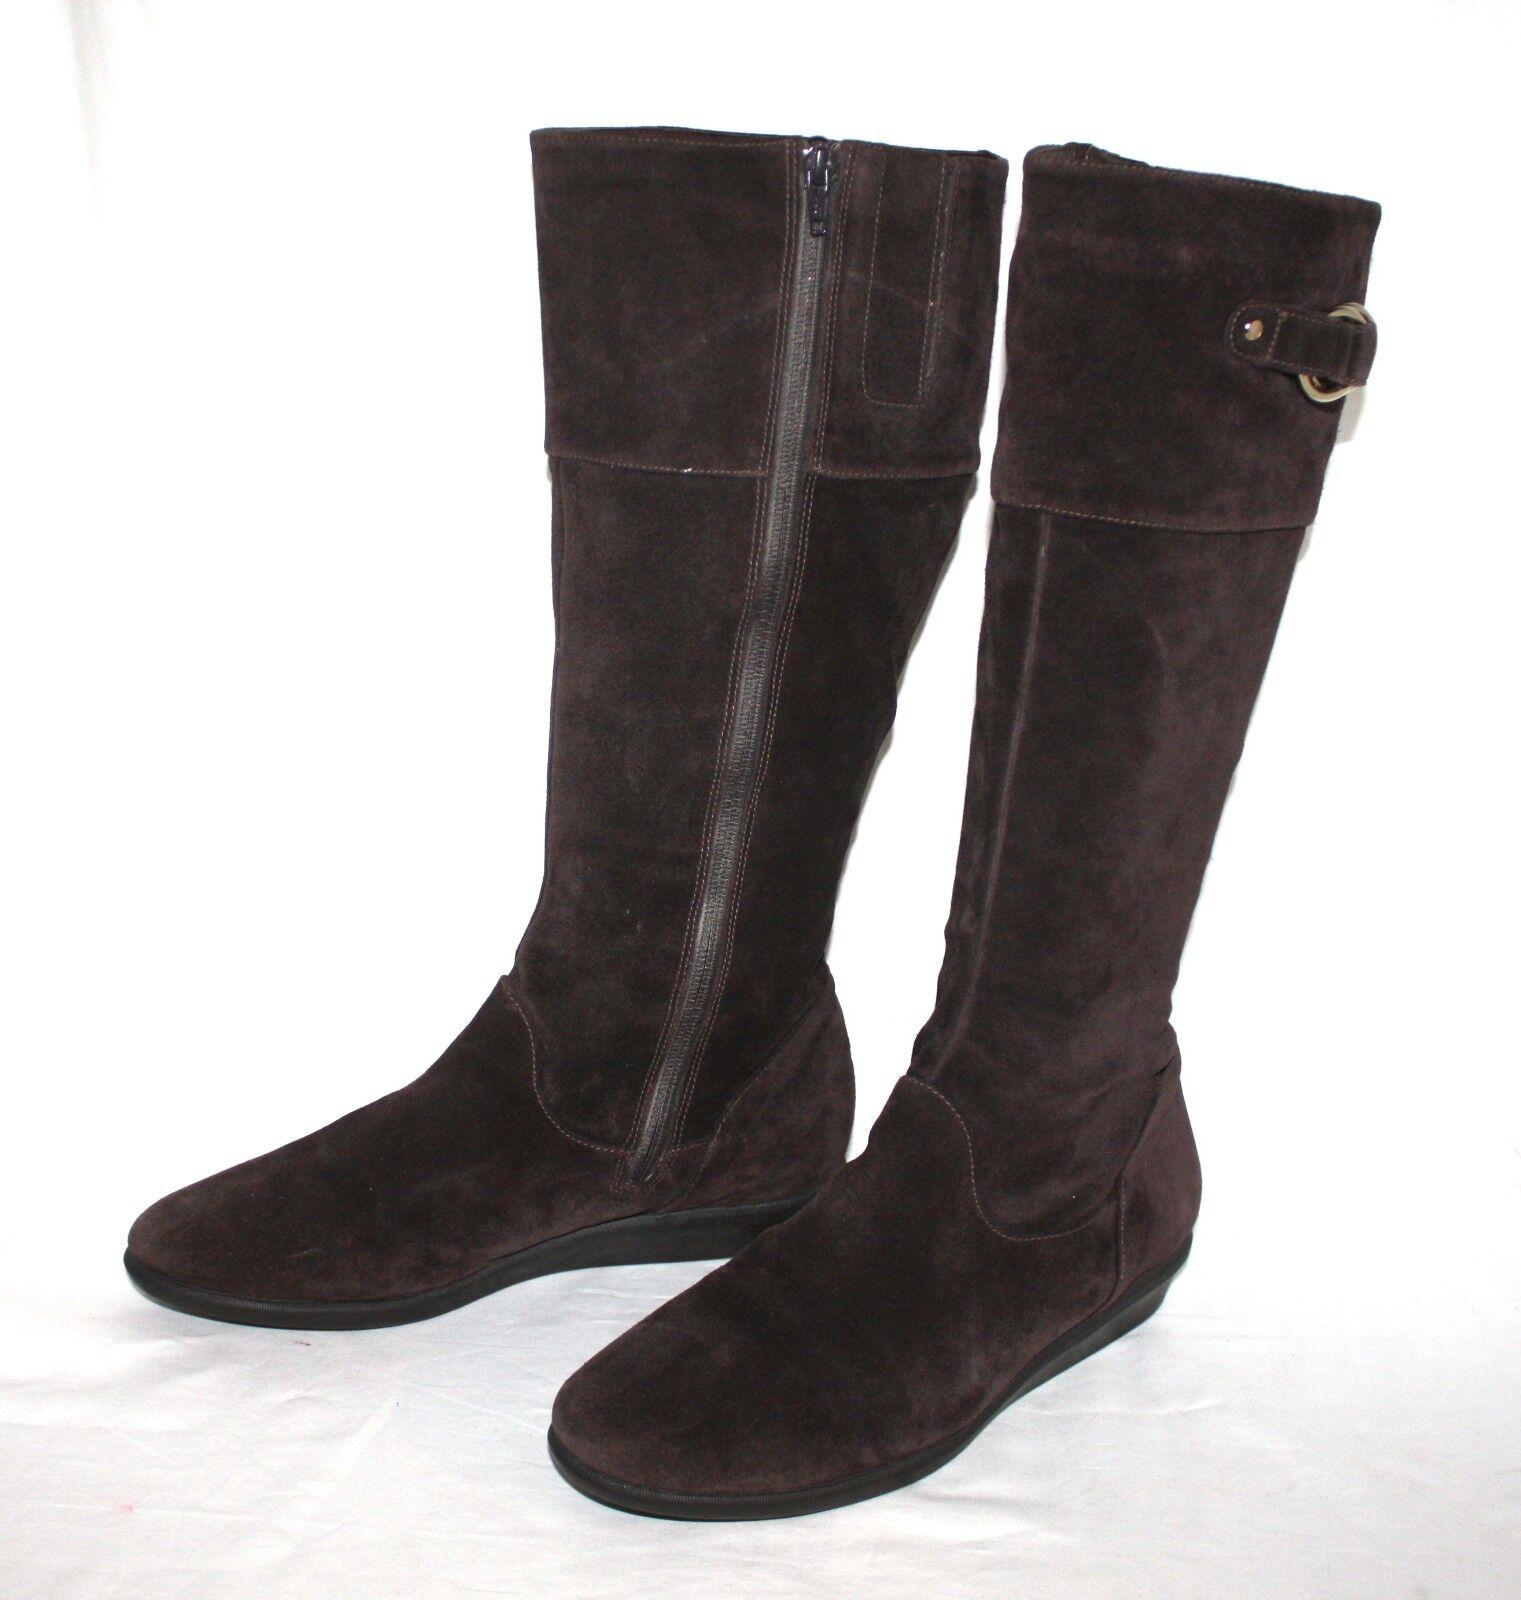 Cole Haan Air Brown Suede Waterproof Wedge Side Zip Tall Women's Boots Sz 10 B